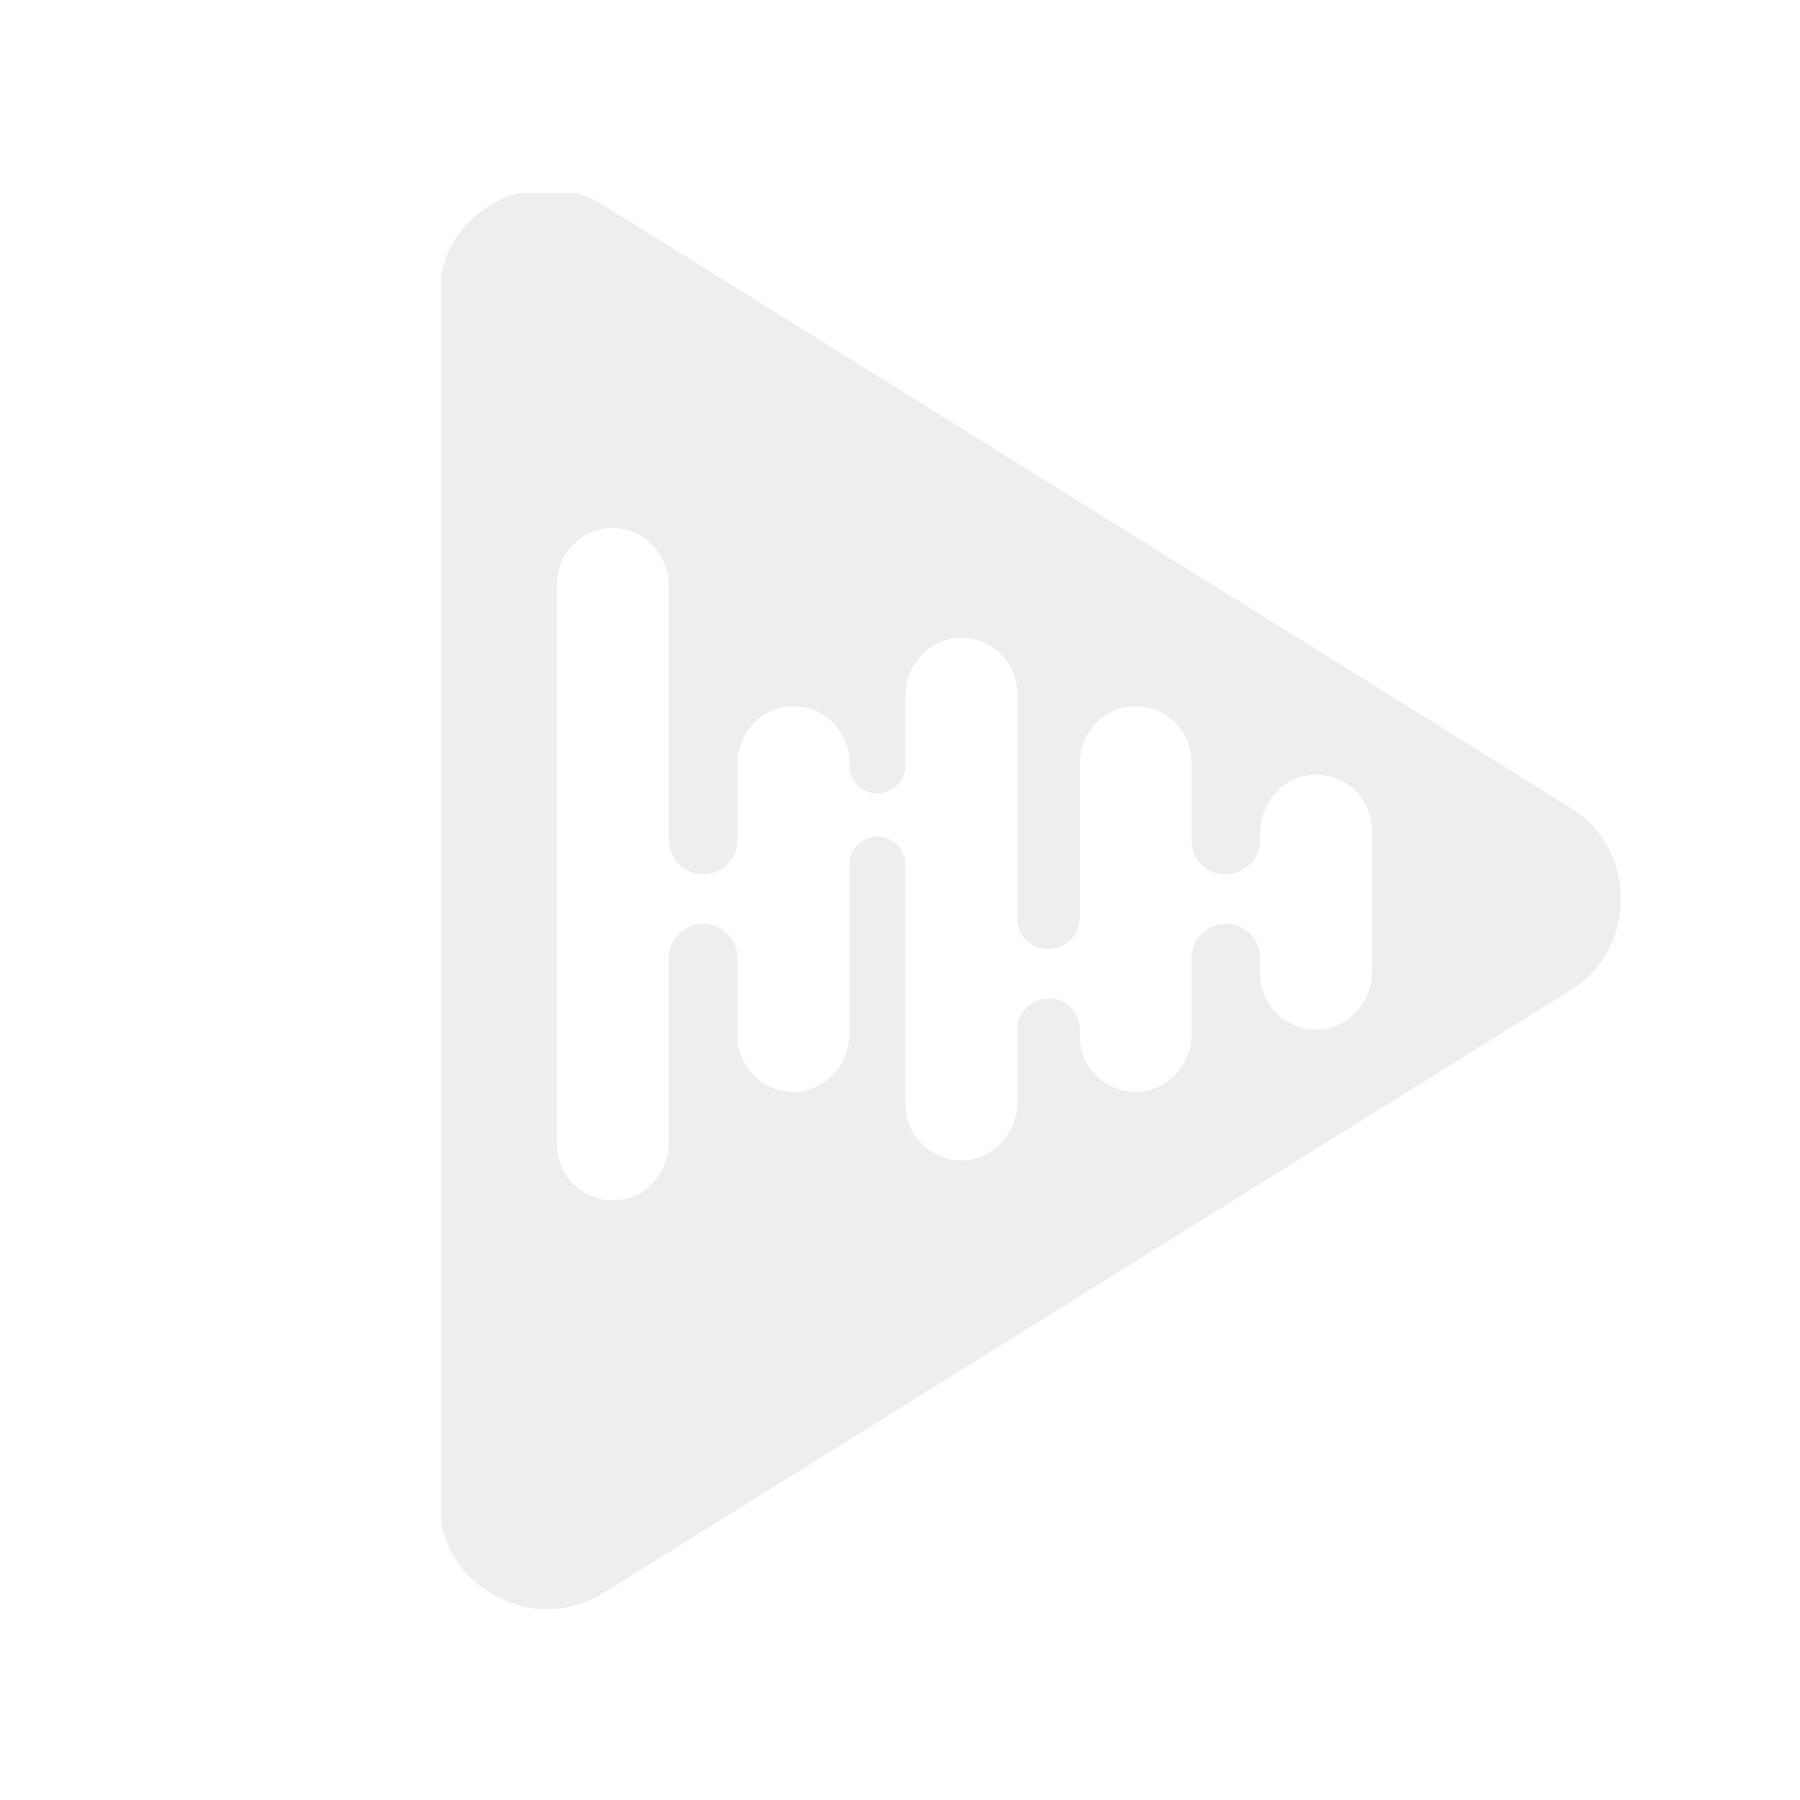 Metra AX-TOYCAM3-6V